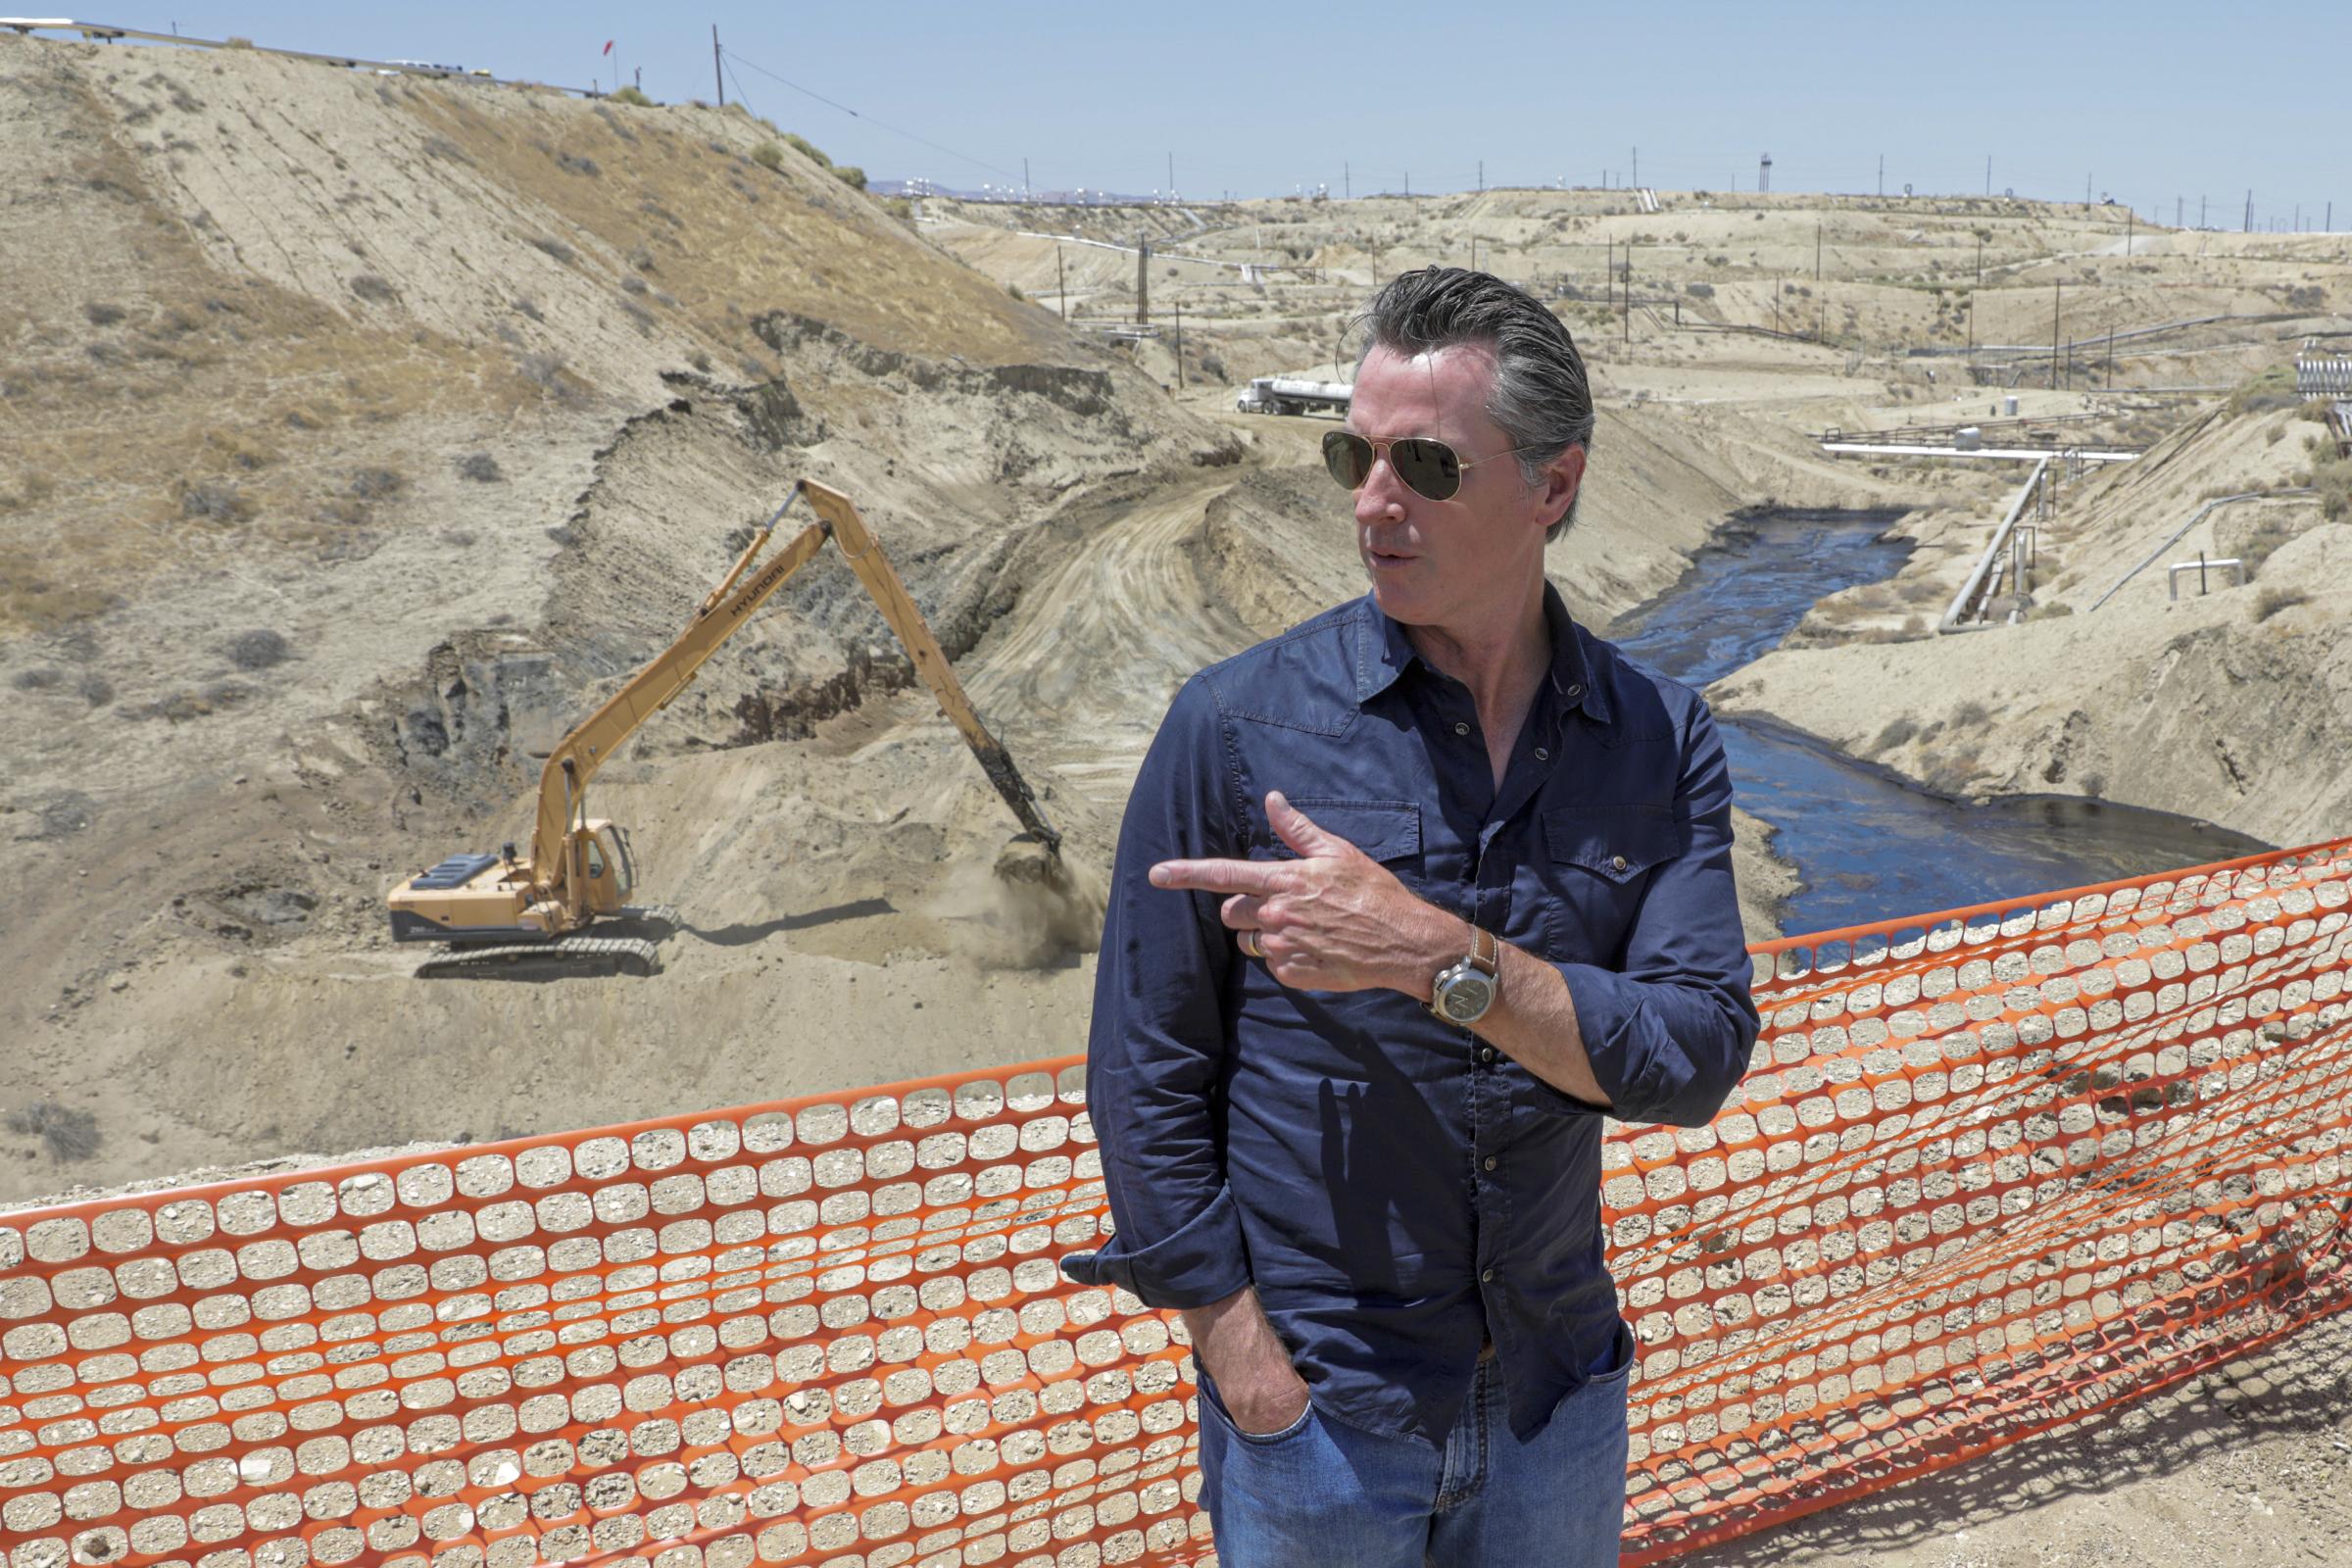 Gavin Newsom visits an oil field in California